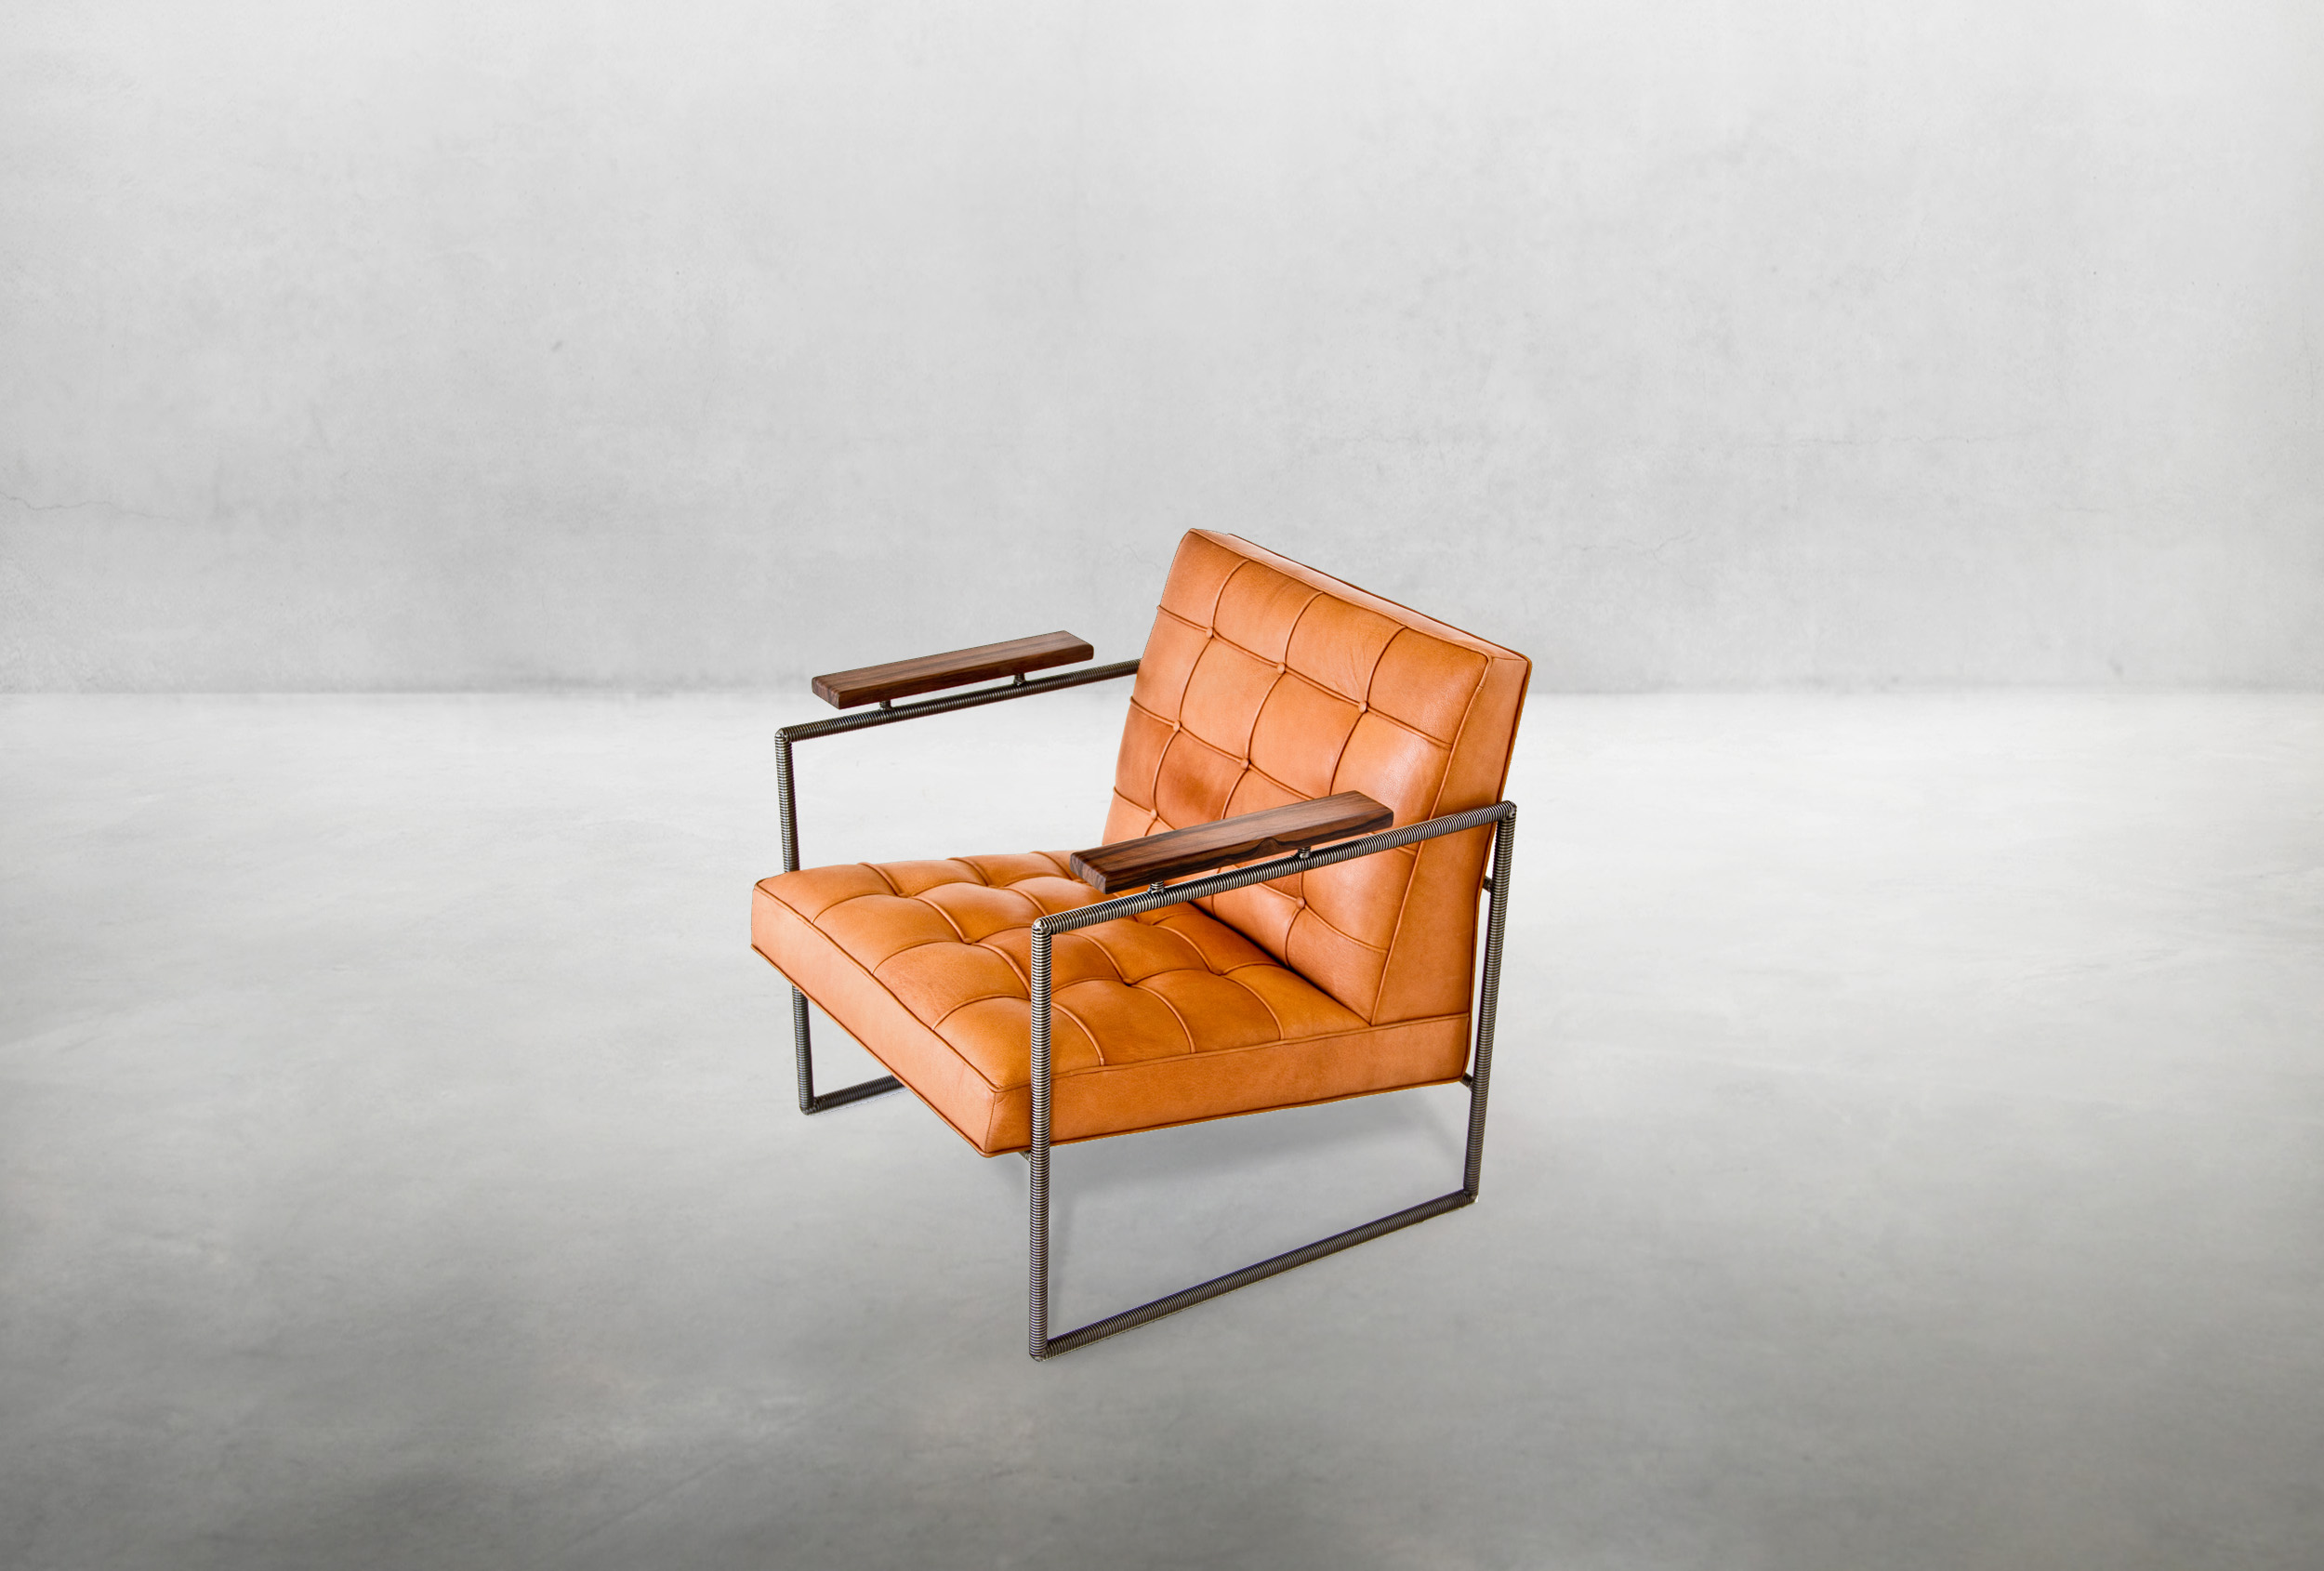 1935 Chair Brown Leather richard velloso olga guanabara title.jpg